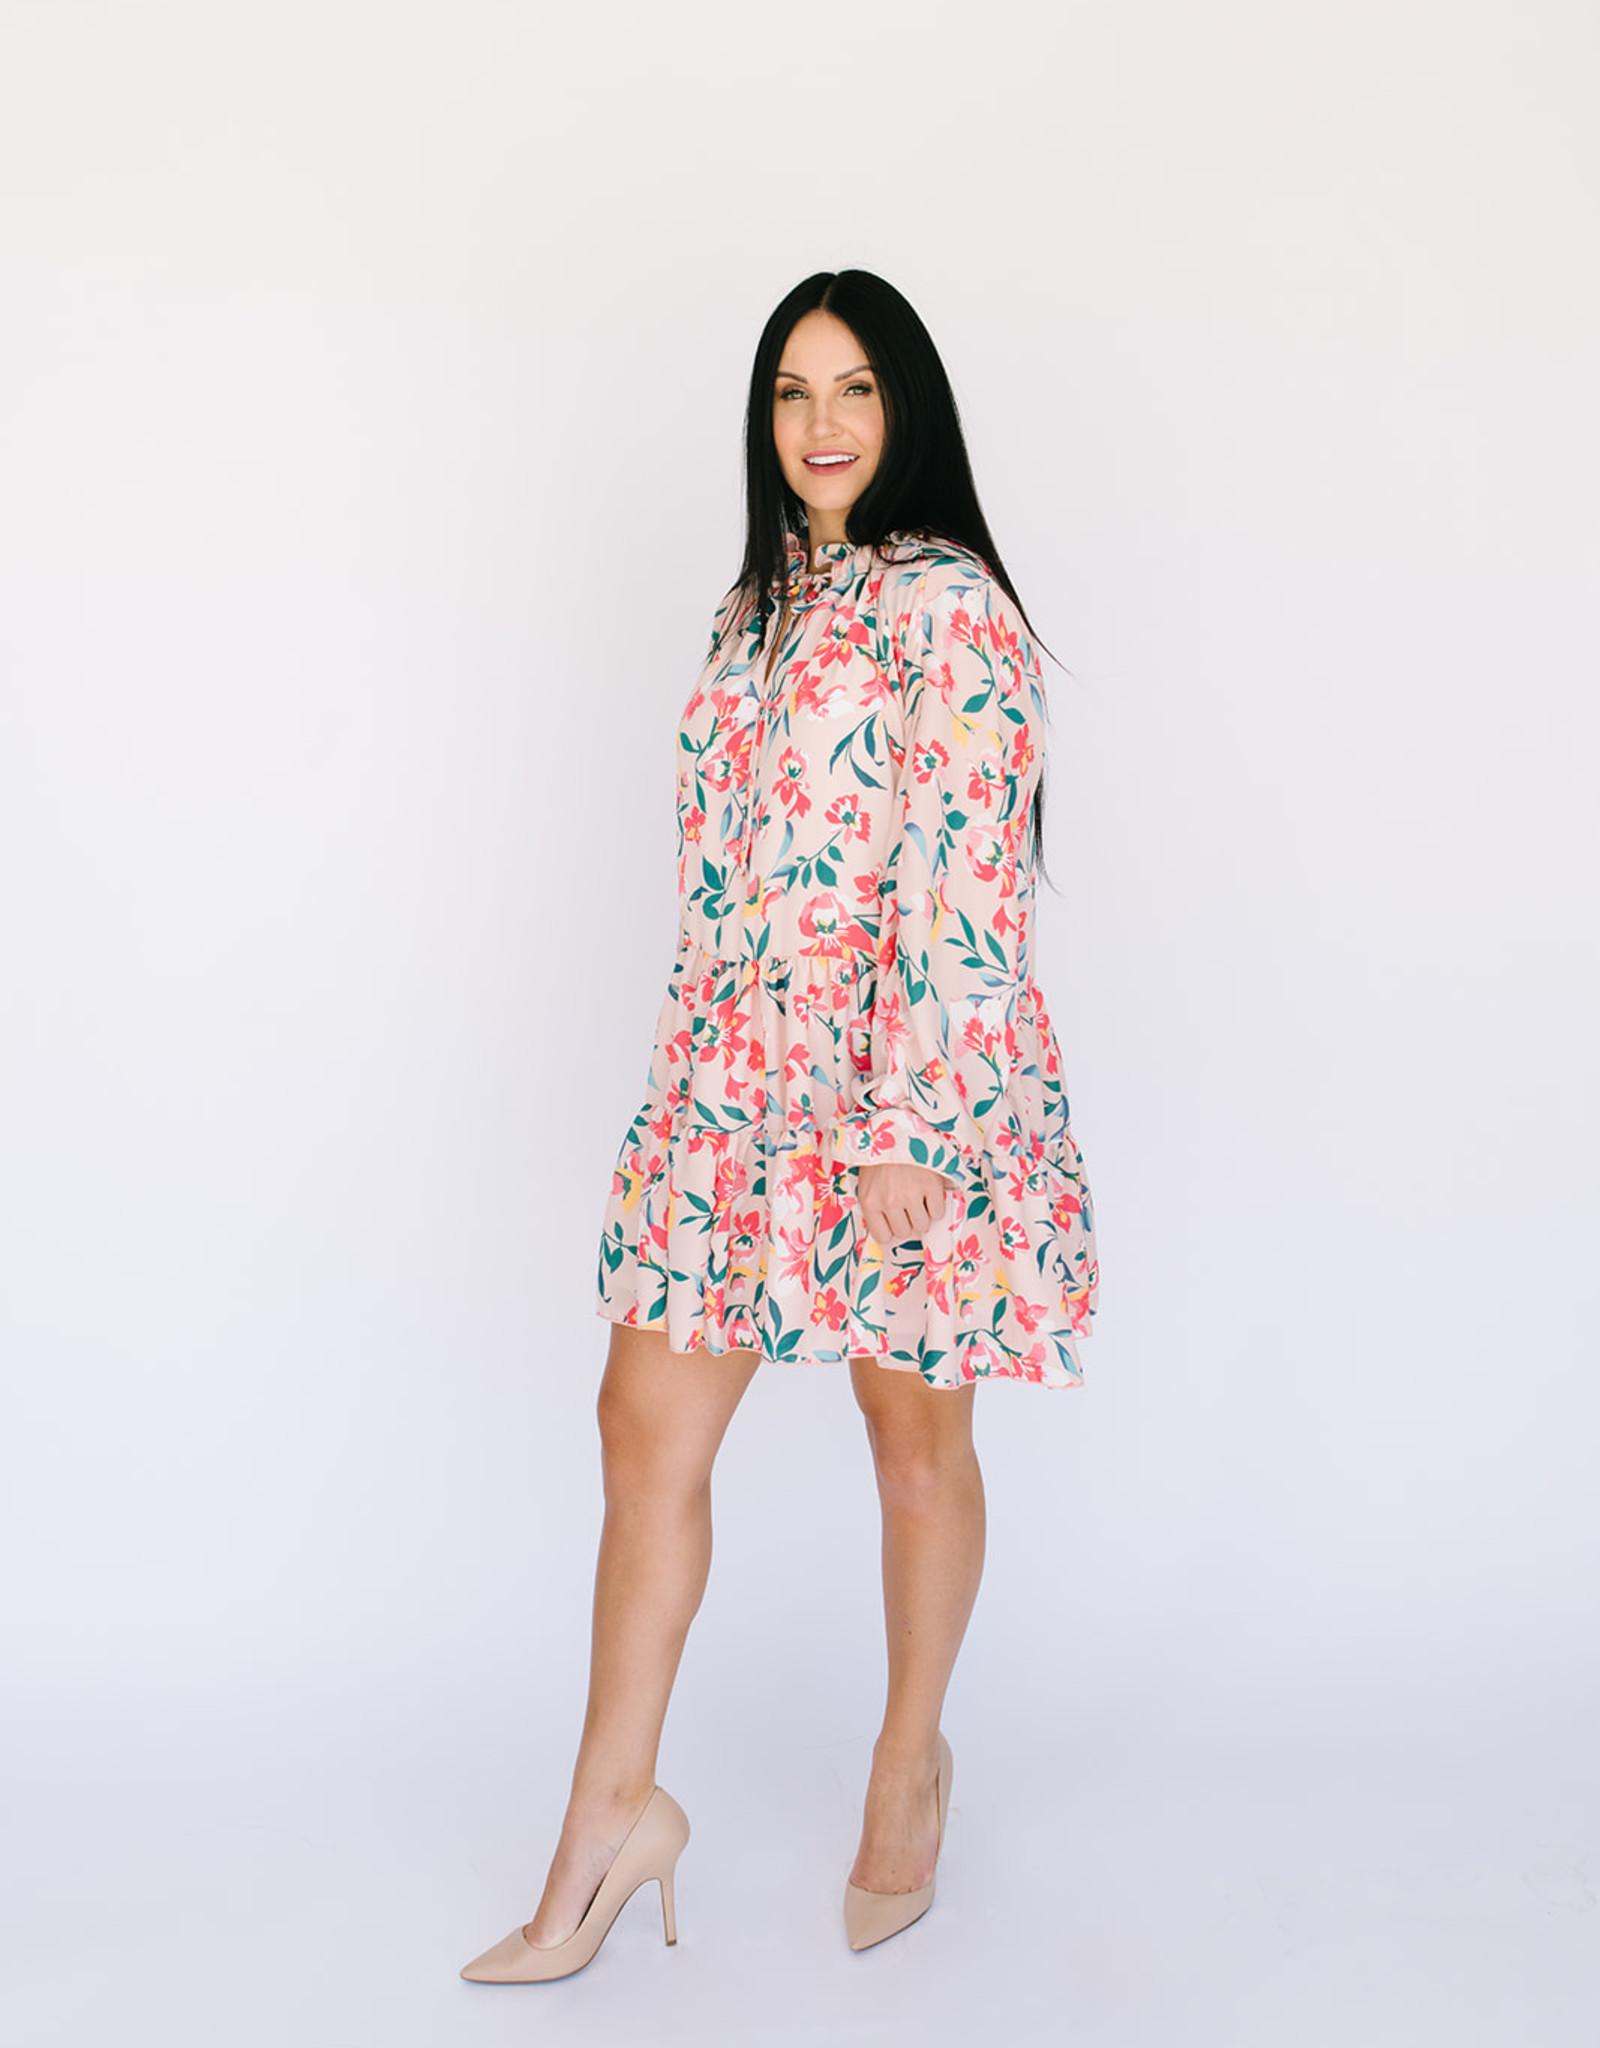 Berkshire Bright Floral Dress